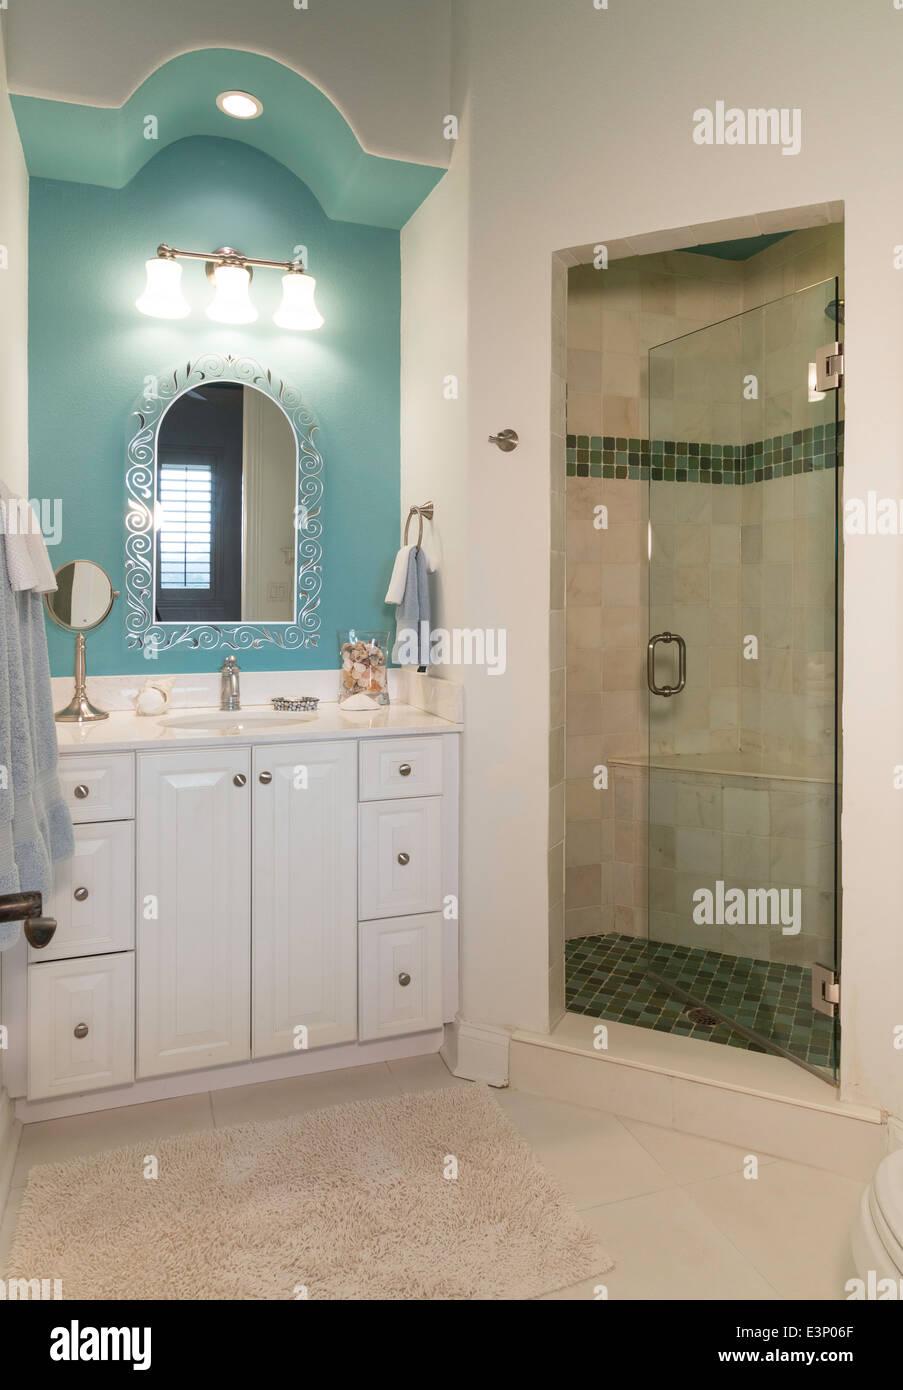 Residential bathroom interior - Stock Image